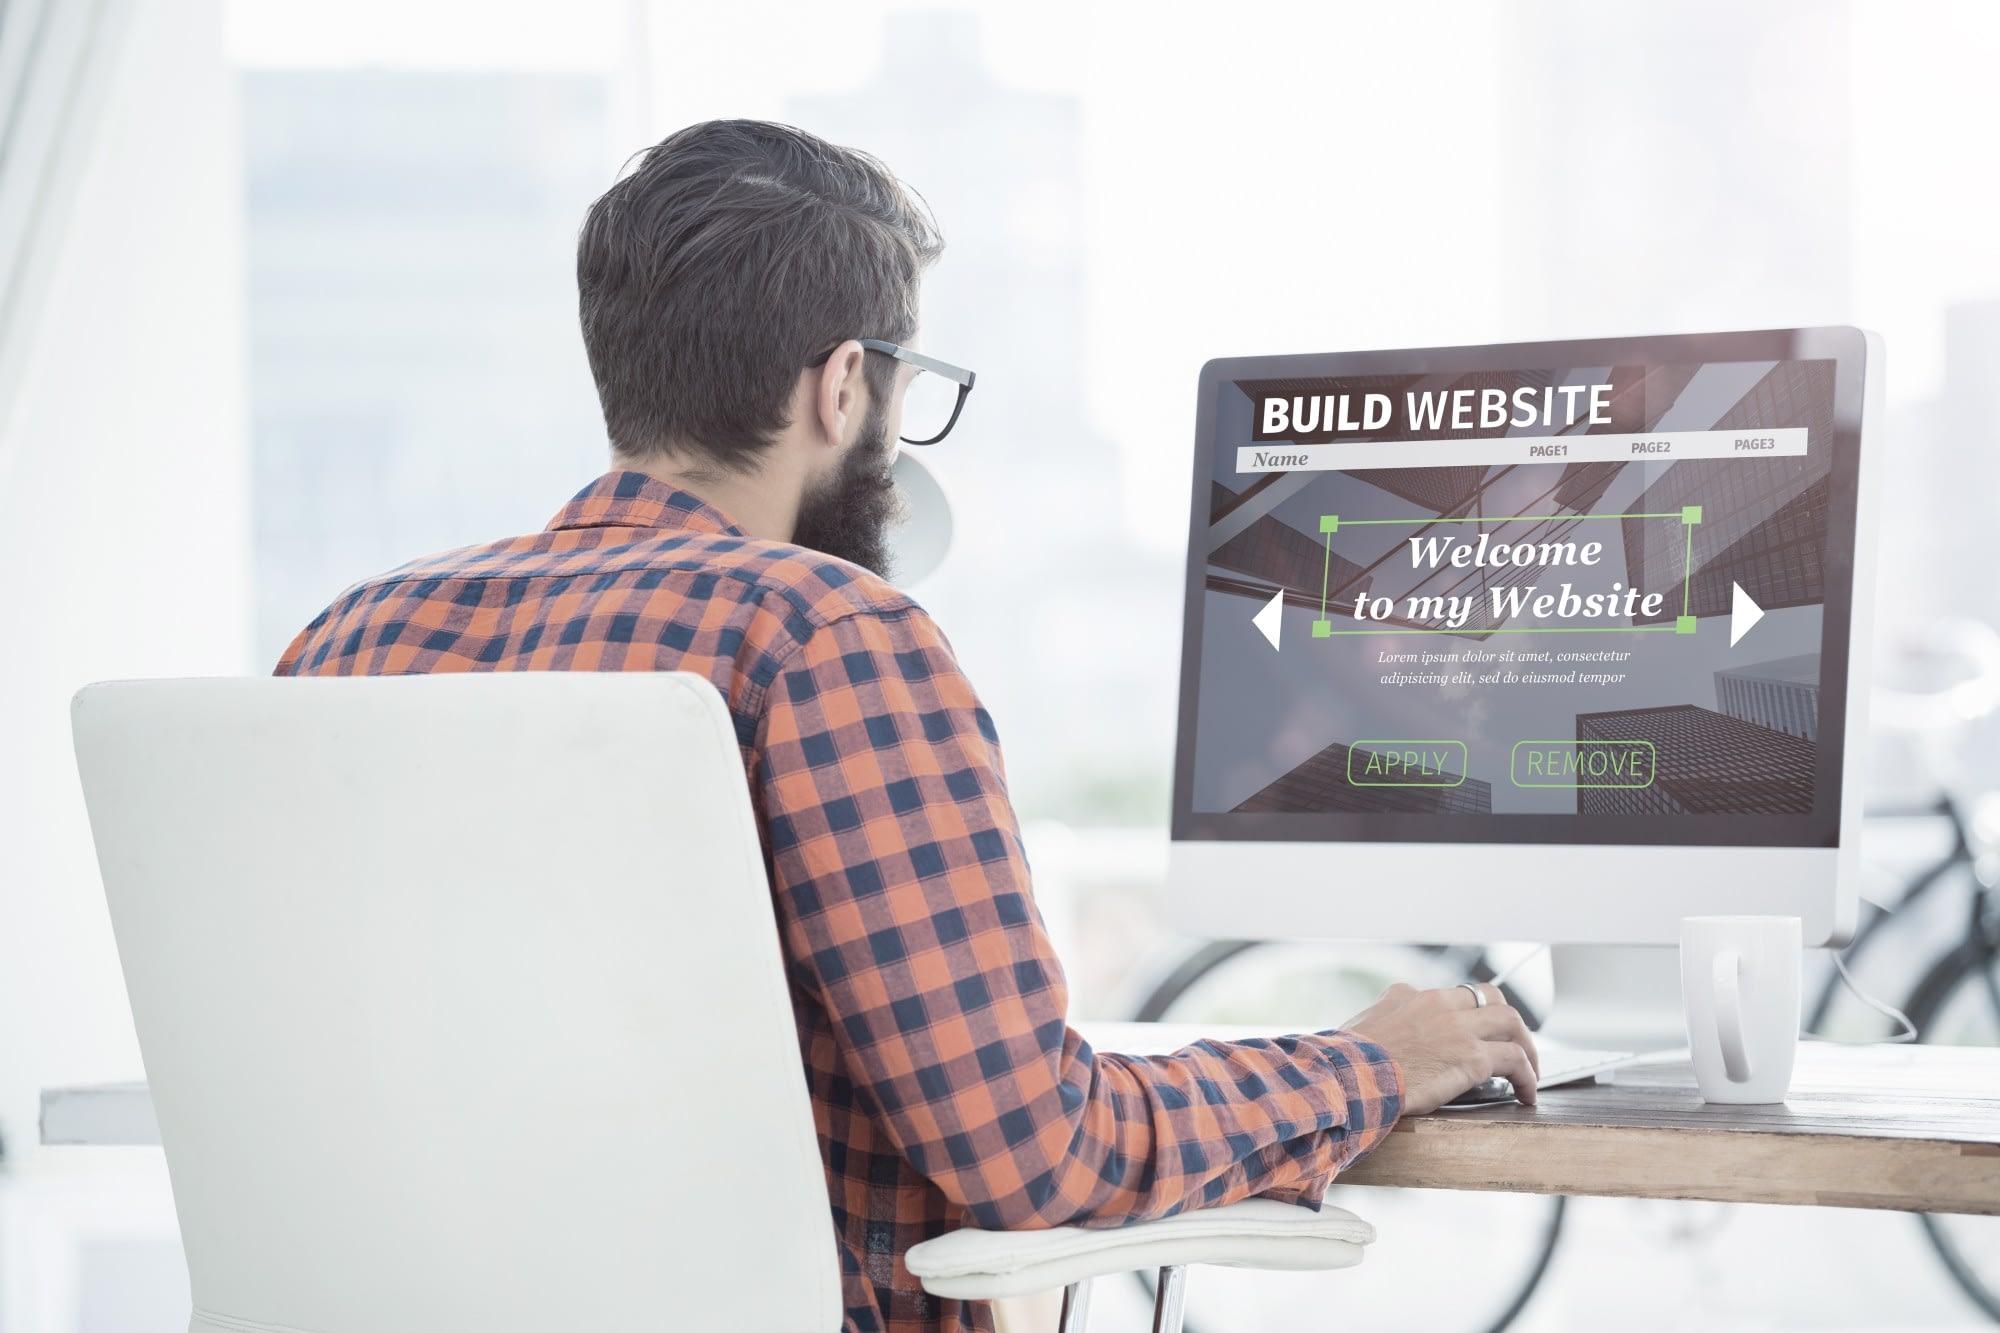 website design and marketing